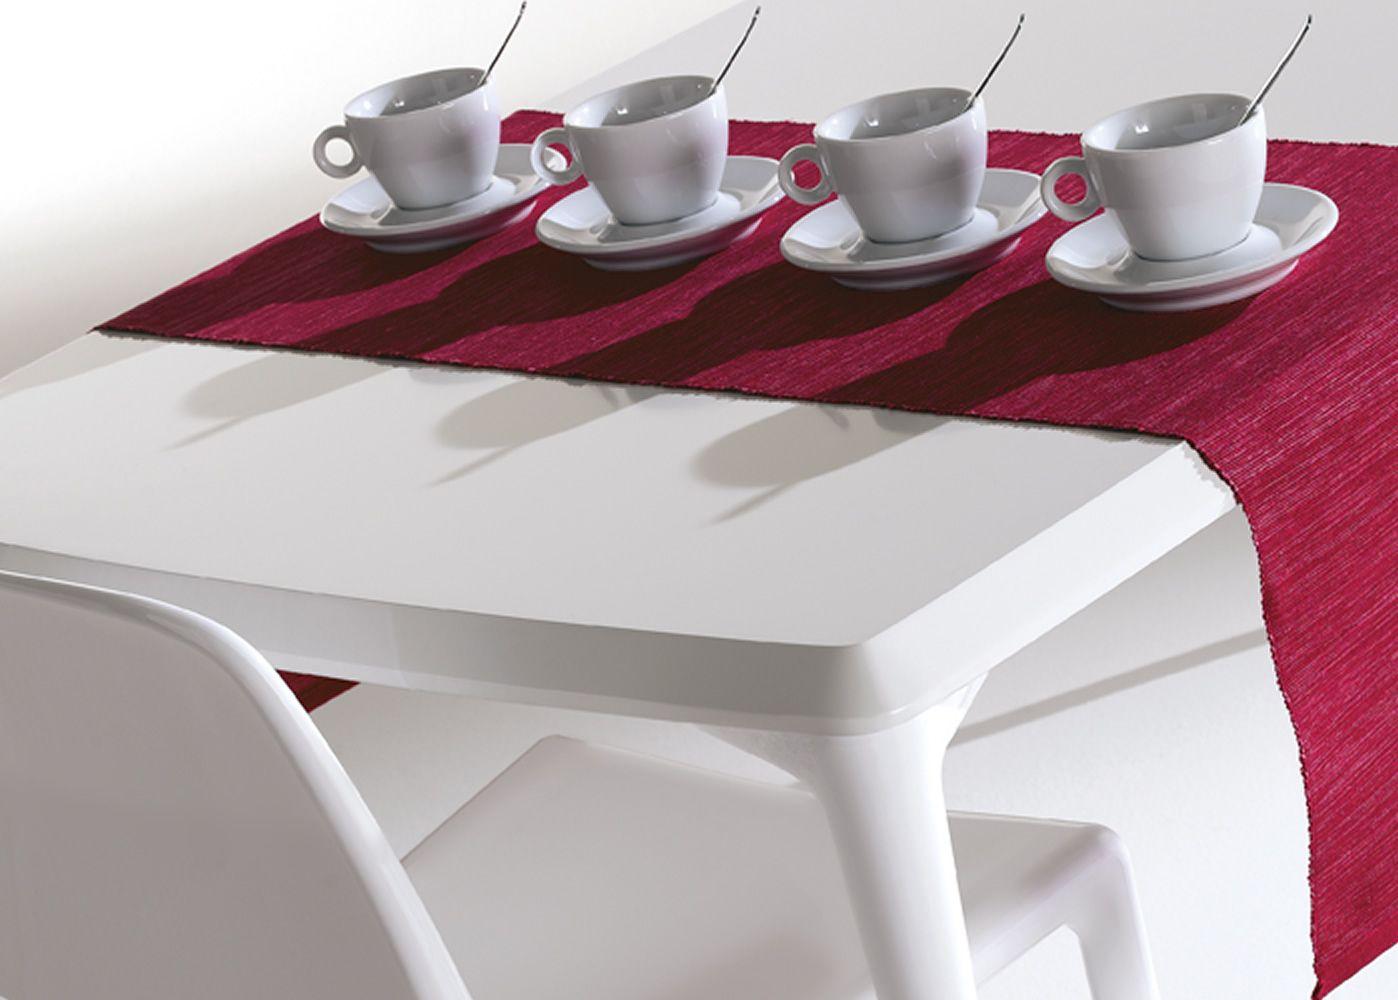 elephas feststehender tisch infiniti aus aluminium platte aus mdf 160 x 80 cm in. Black Bedroom Furniture Sets. Home Design Ideas